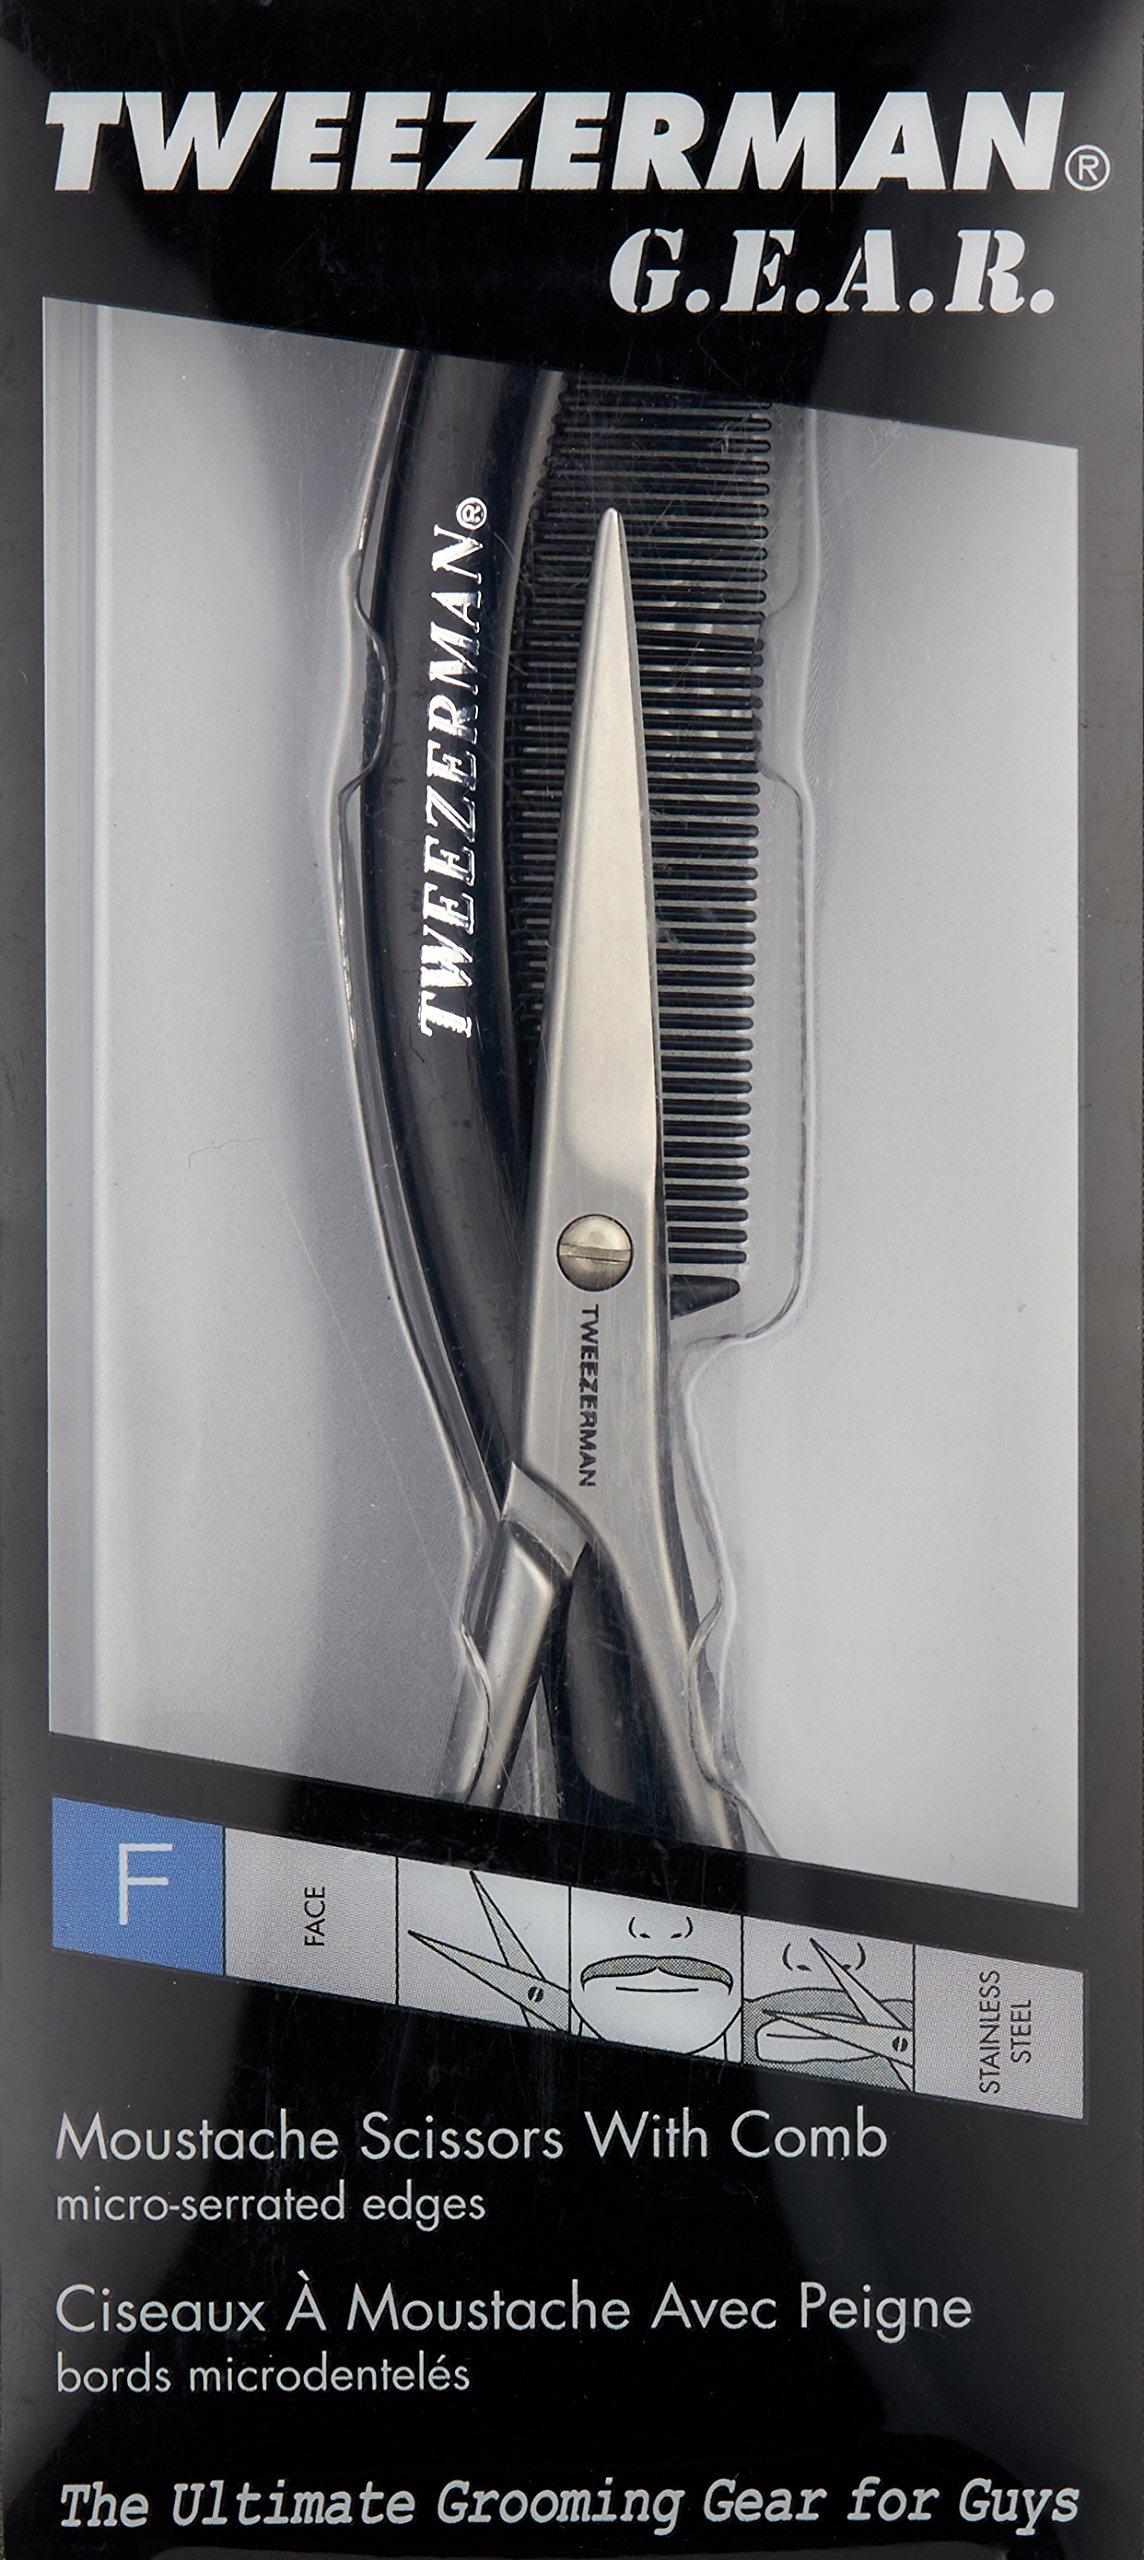 Tweezerman G.E.A.R. Moustache Scissors with Comb by Tweezerman (Image #3)